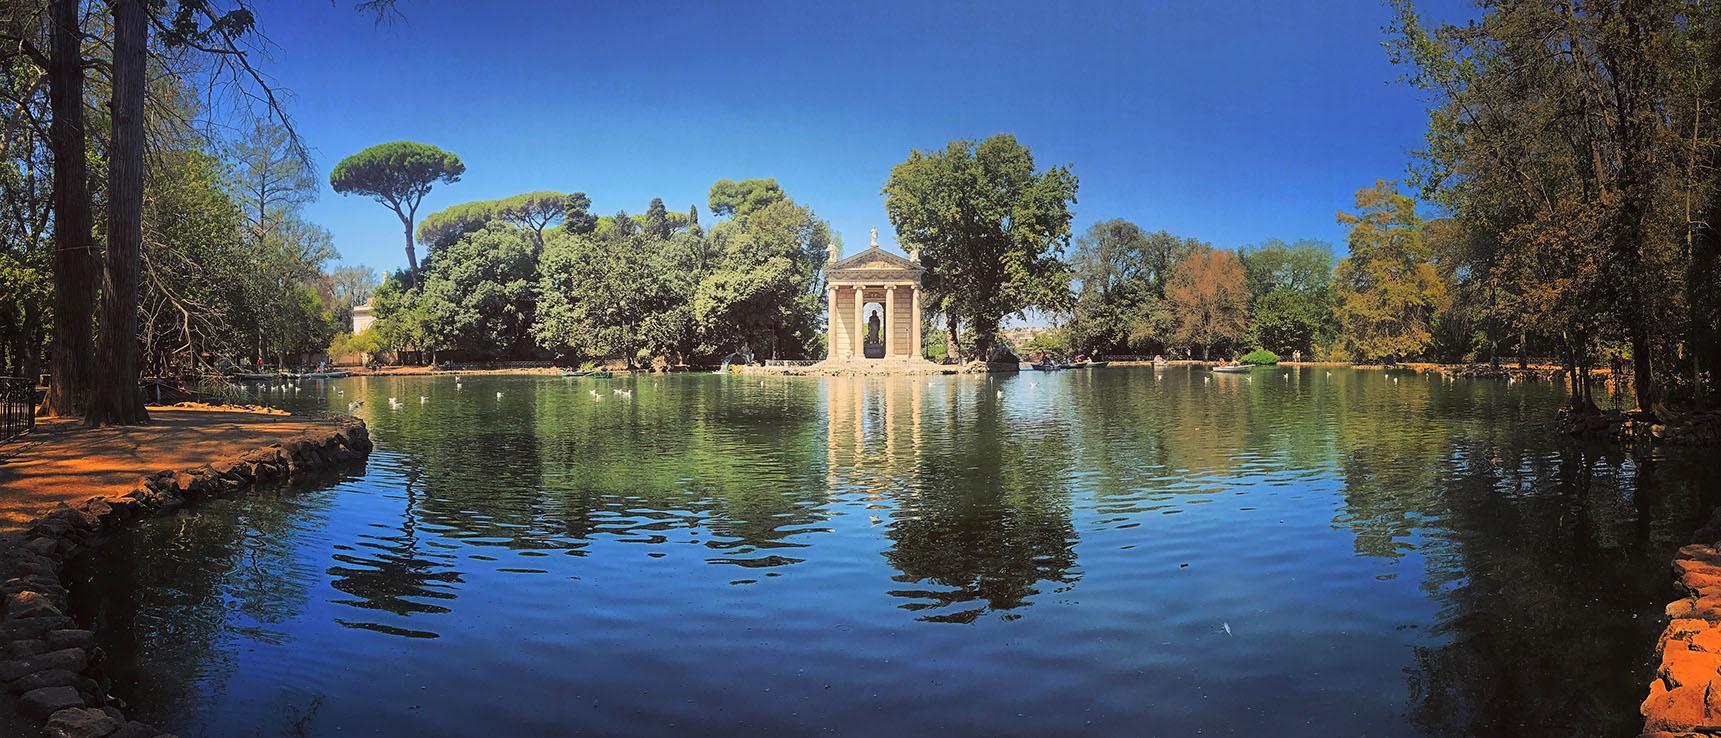 Jardins palais borghese lac rome italie